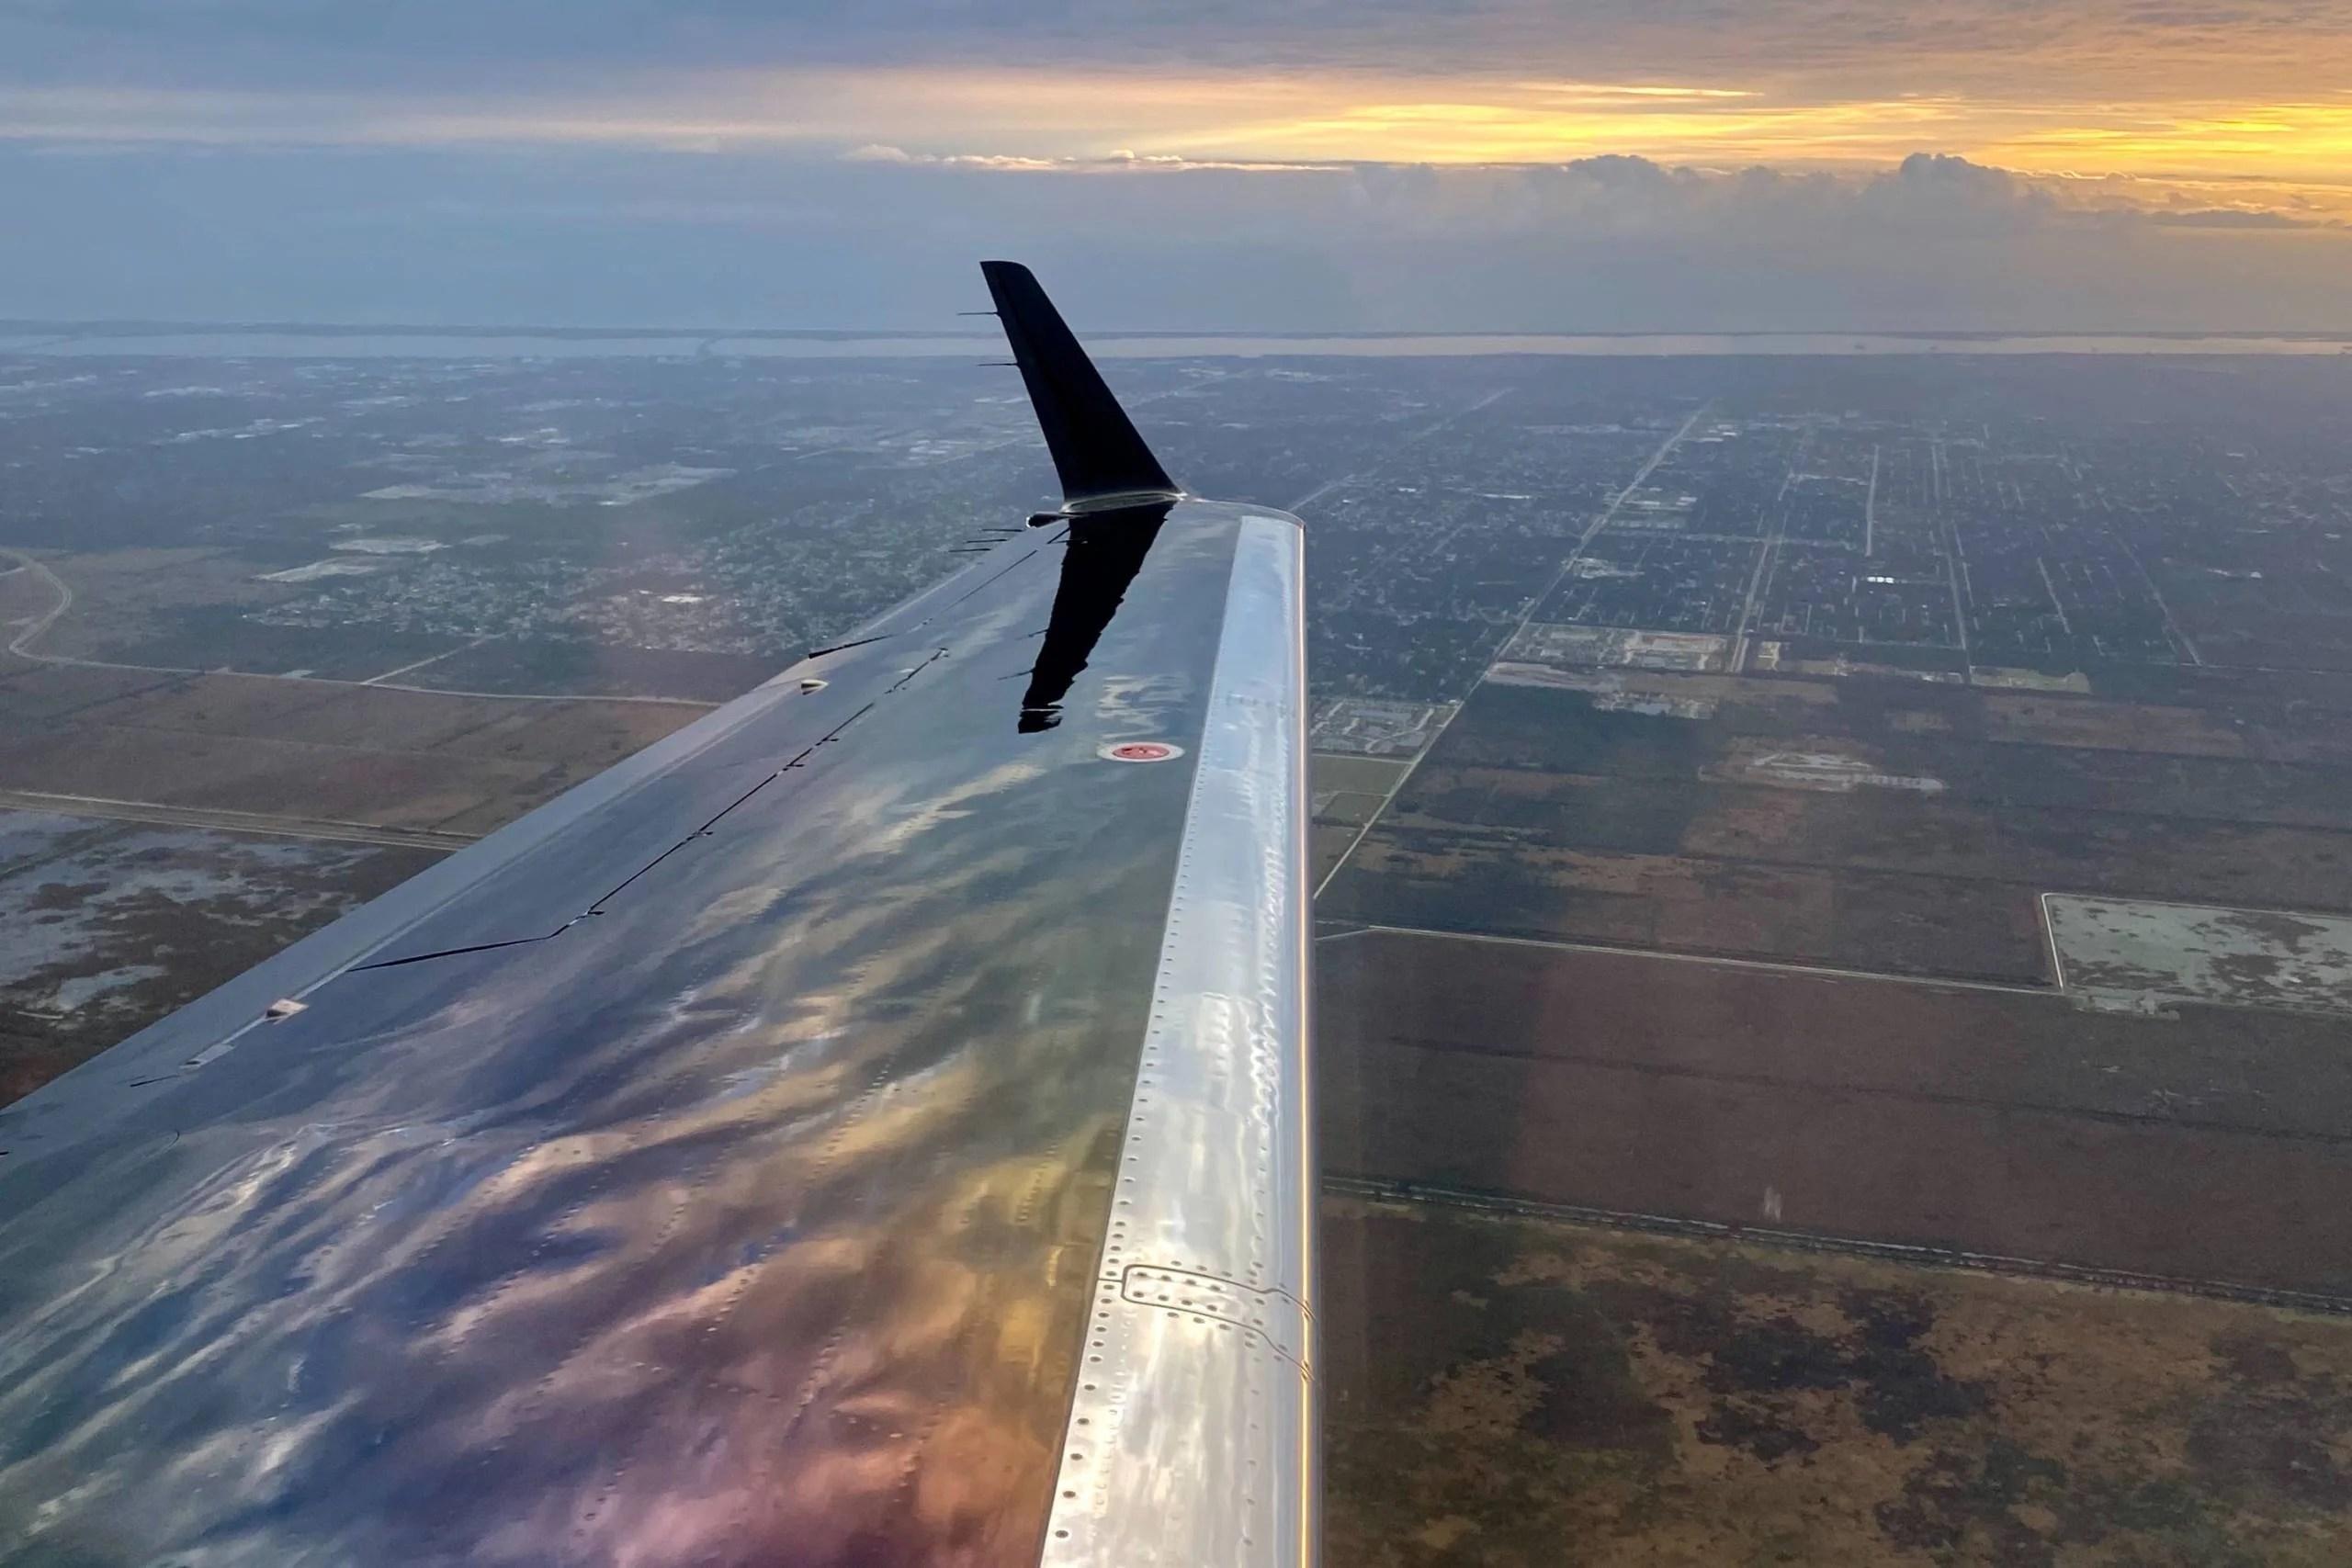 Flying Embraer's super posh, quiet $10 million private jet